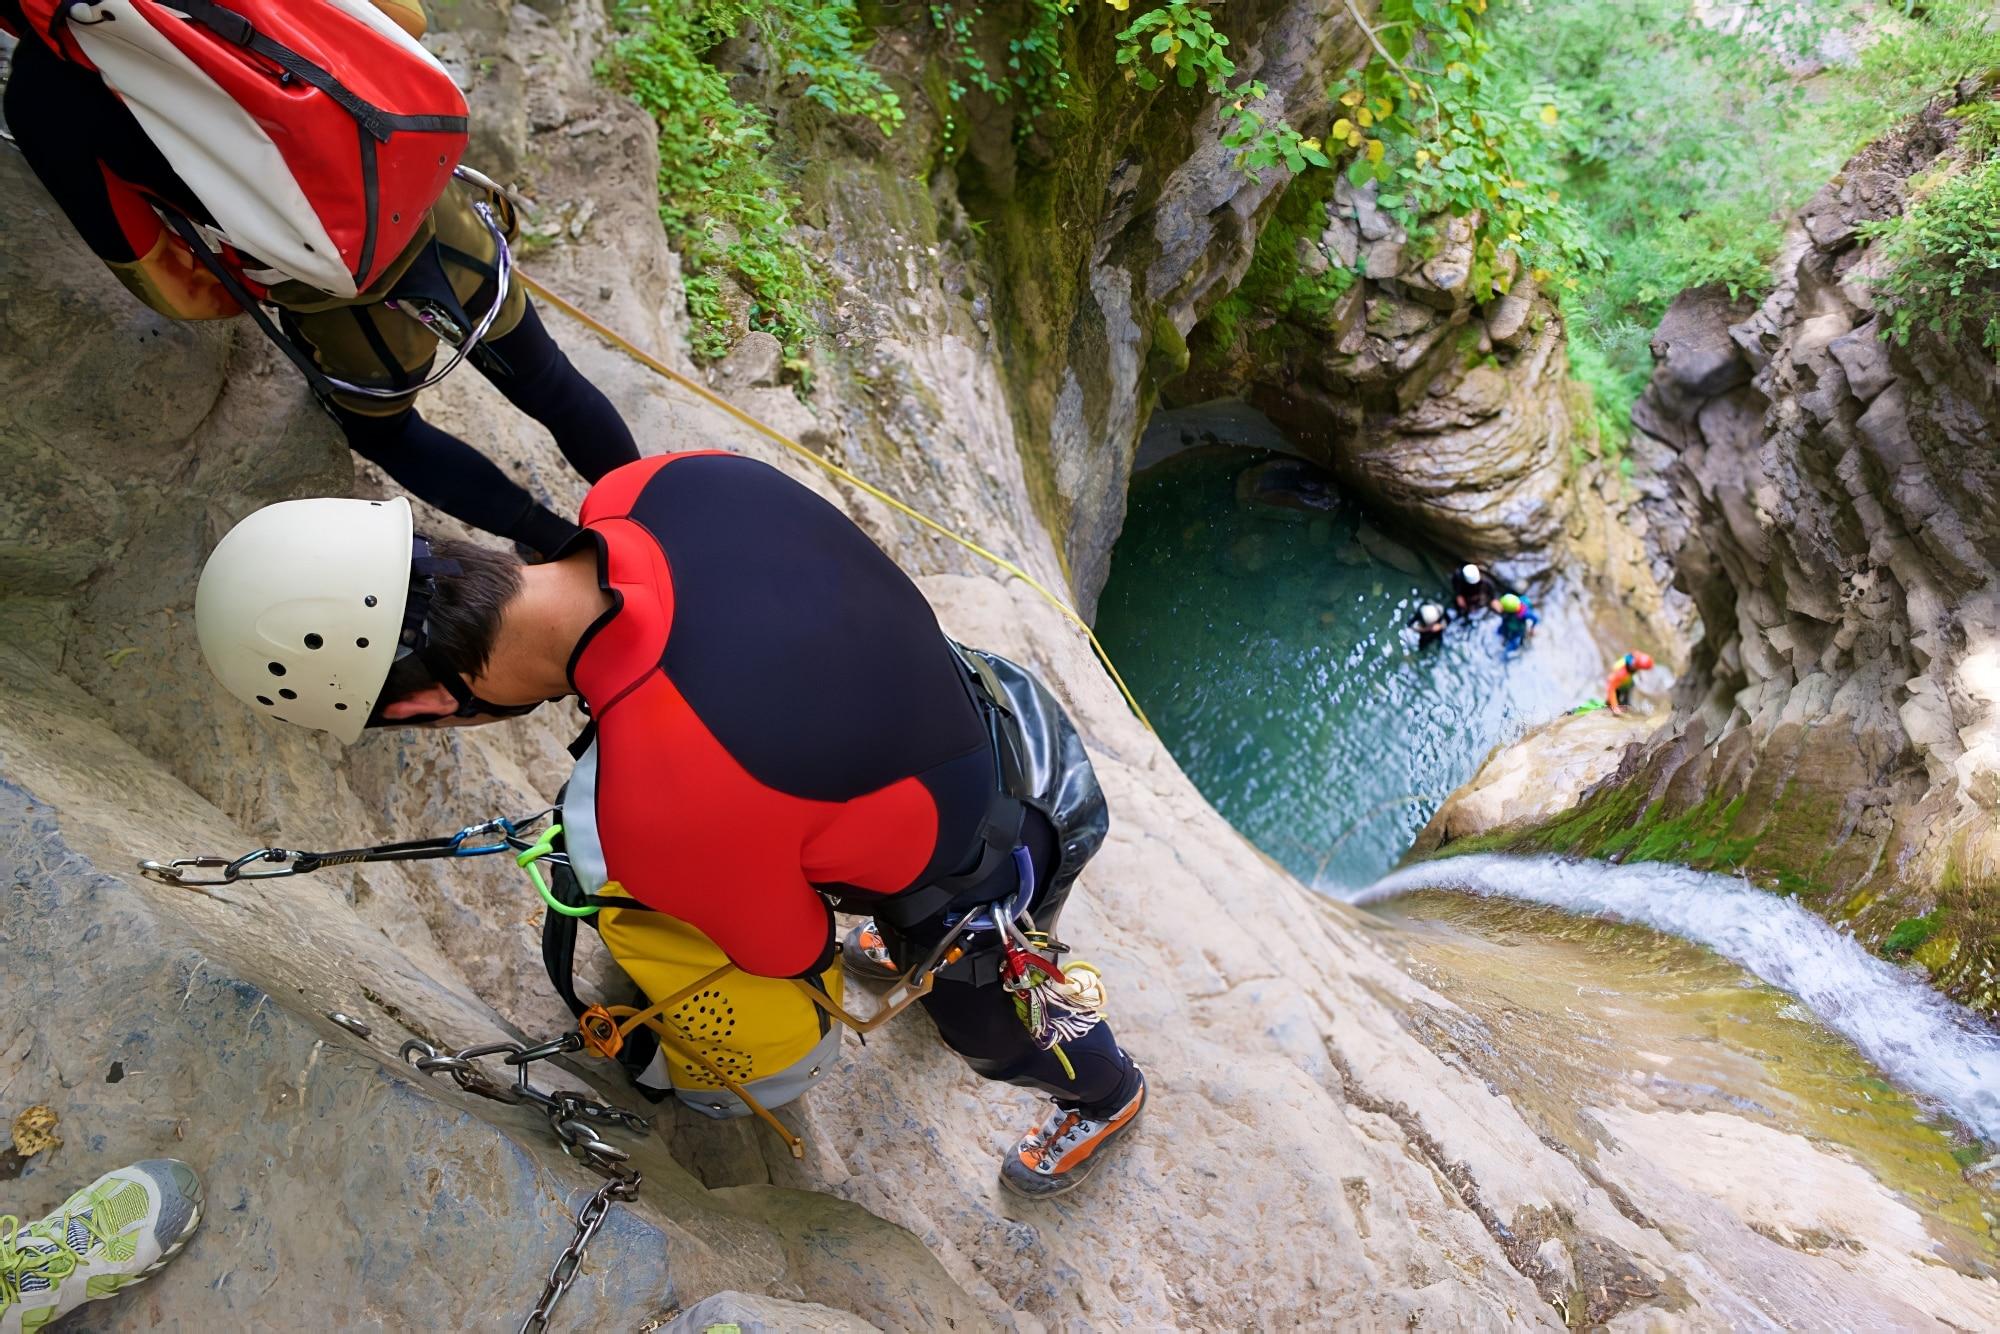 Canyoning dans le canyon Furco, Broto, Pyrénées, province de Huesca, Aragon, Espagne.